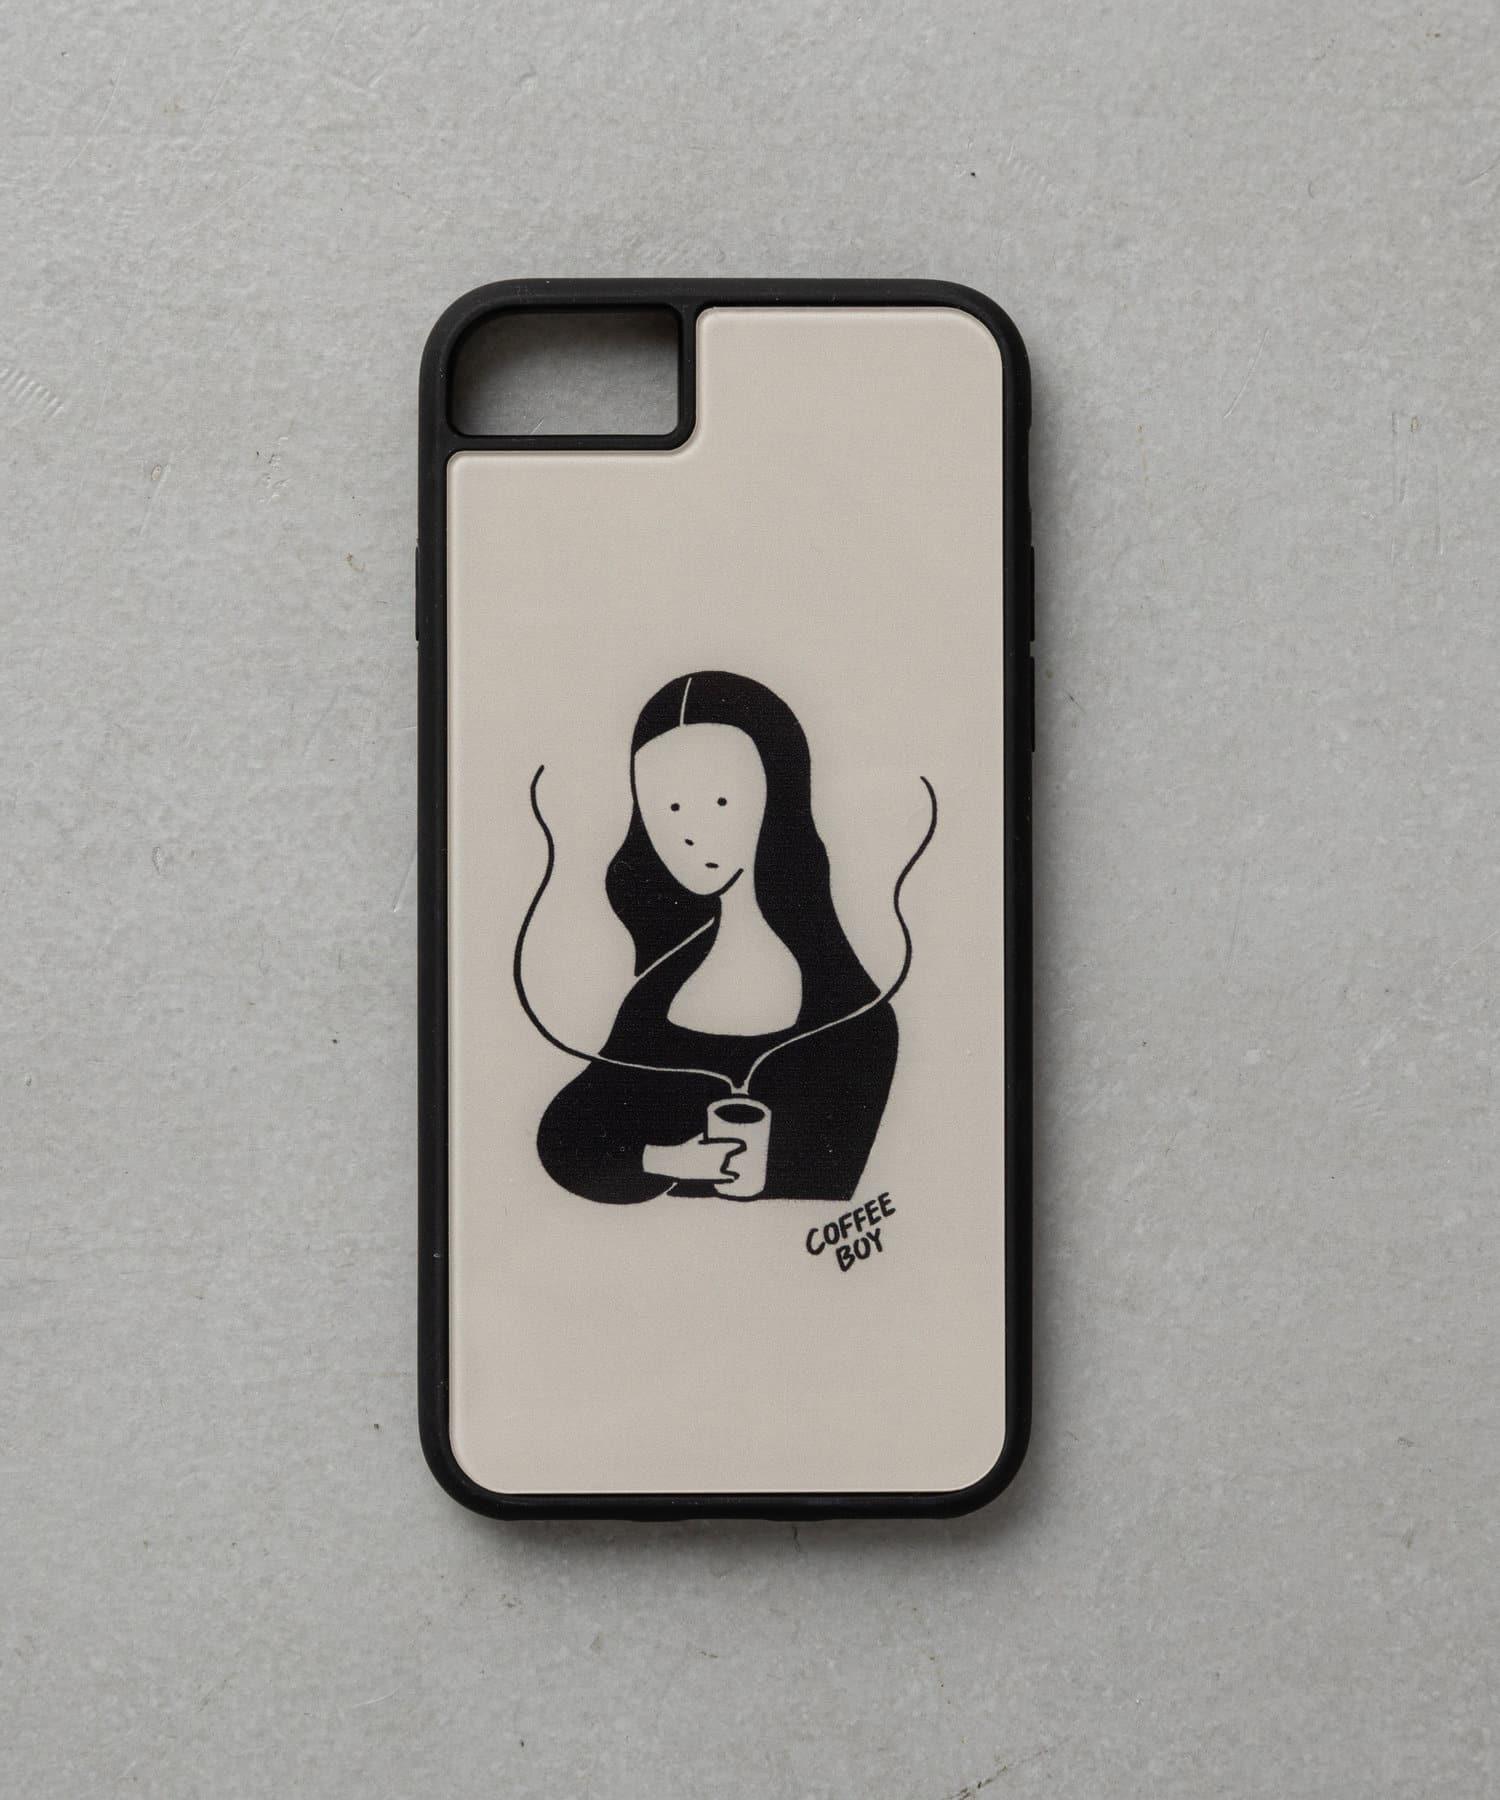 BIRTHDAY BAR(バースデイバー) 【COFFEE BOY】iPhoneケース